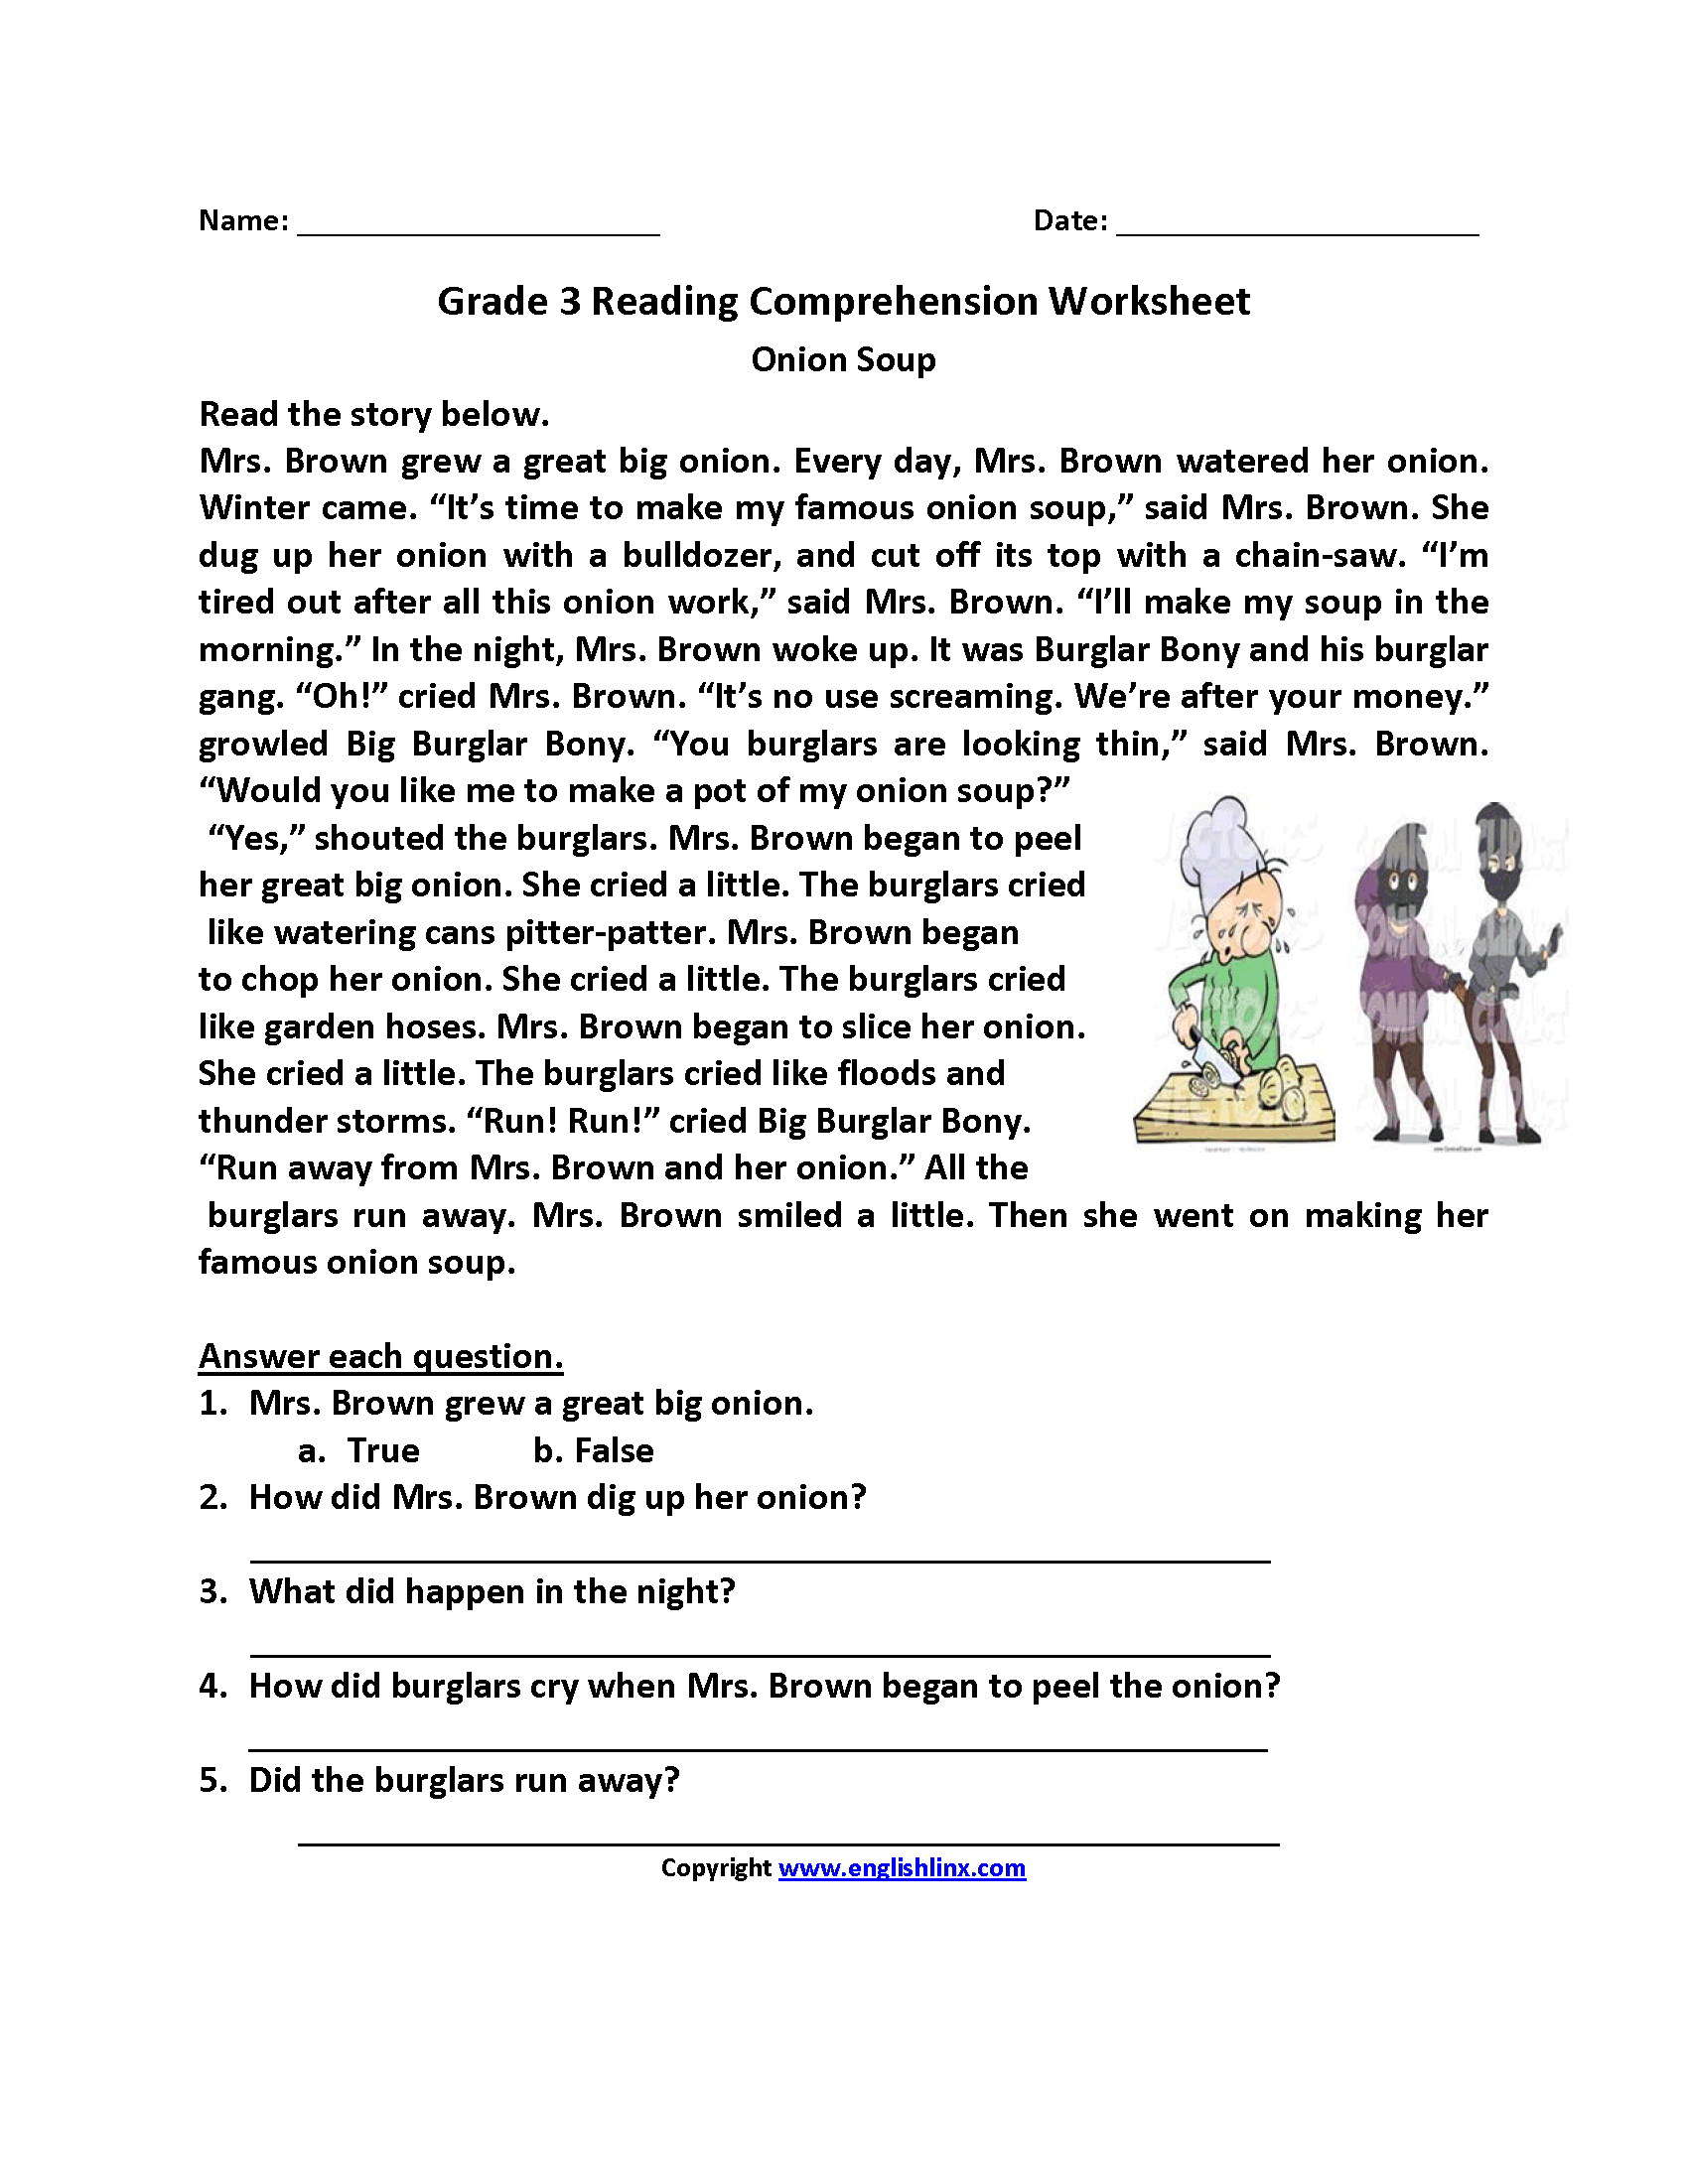 Reading Worksheets For 3rd Grade The Best Worksheets Image